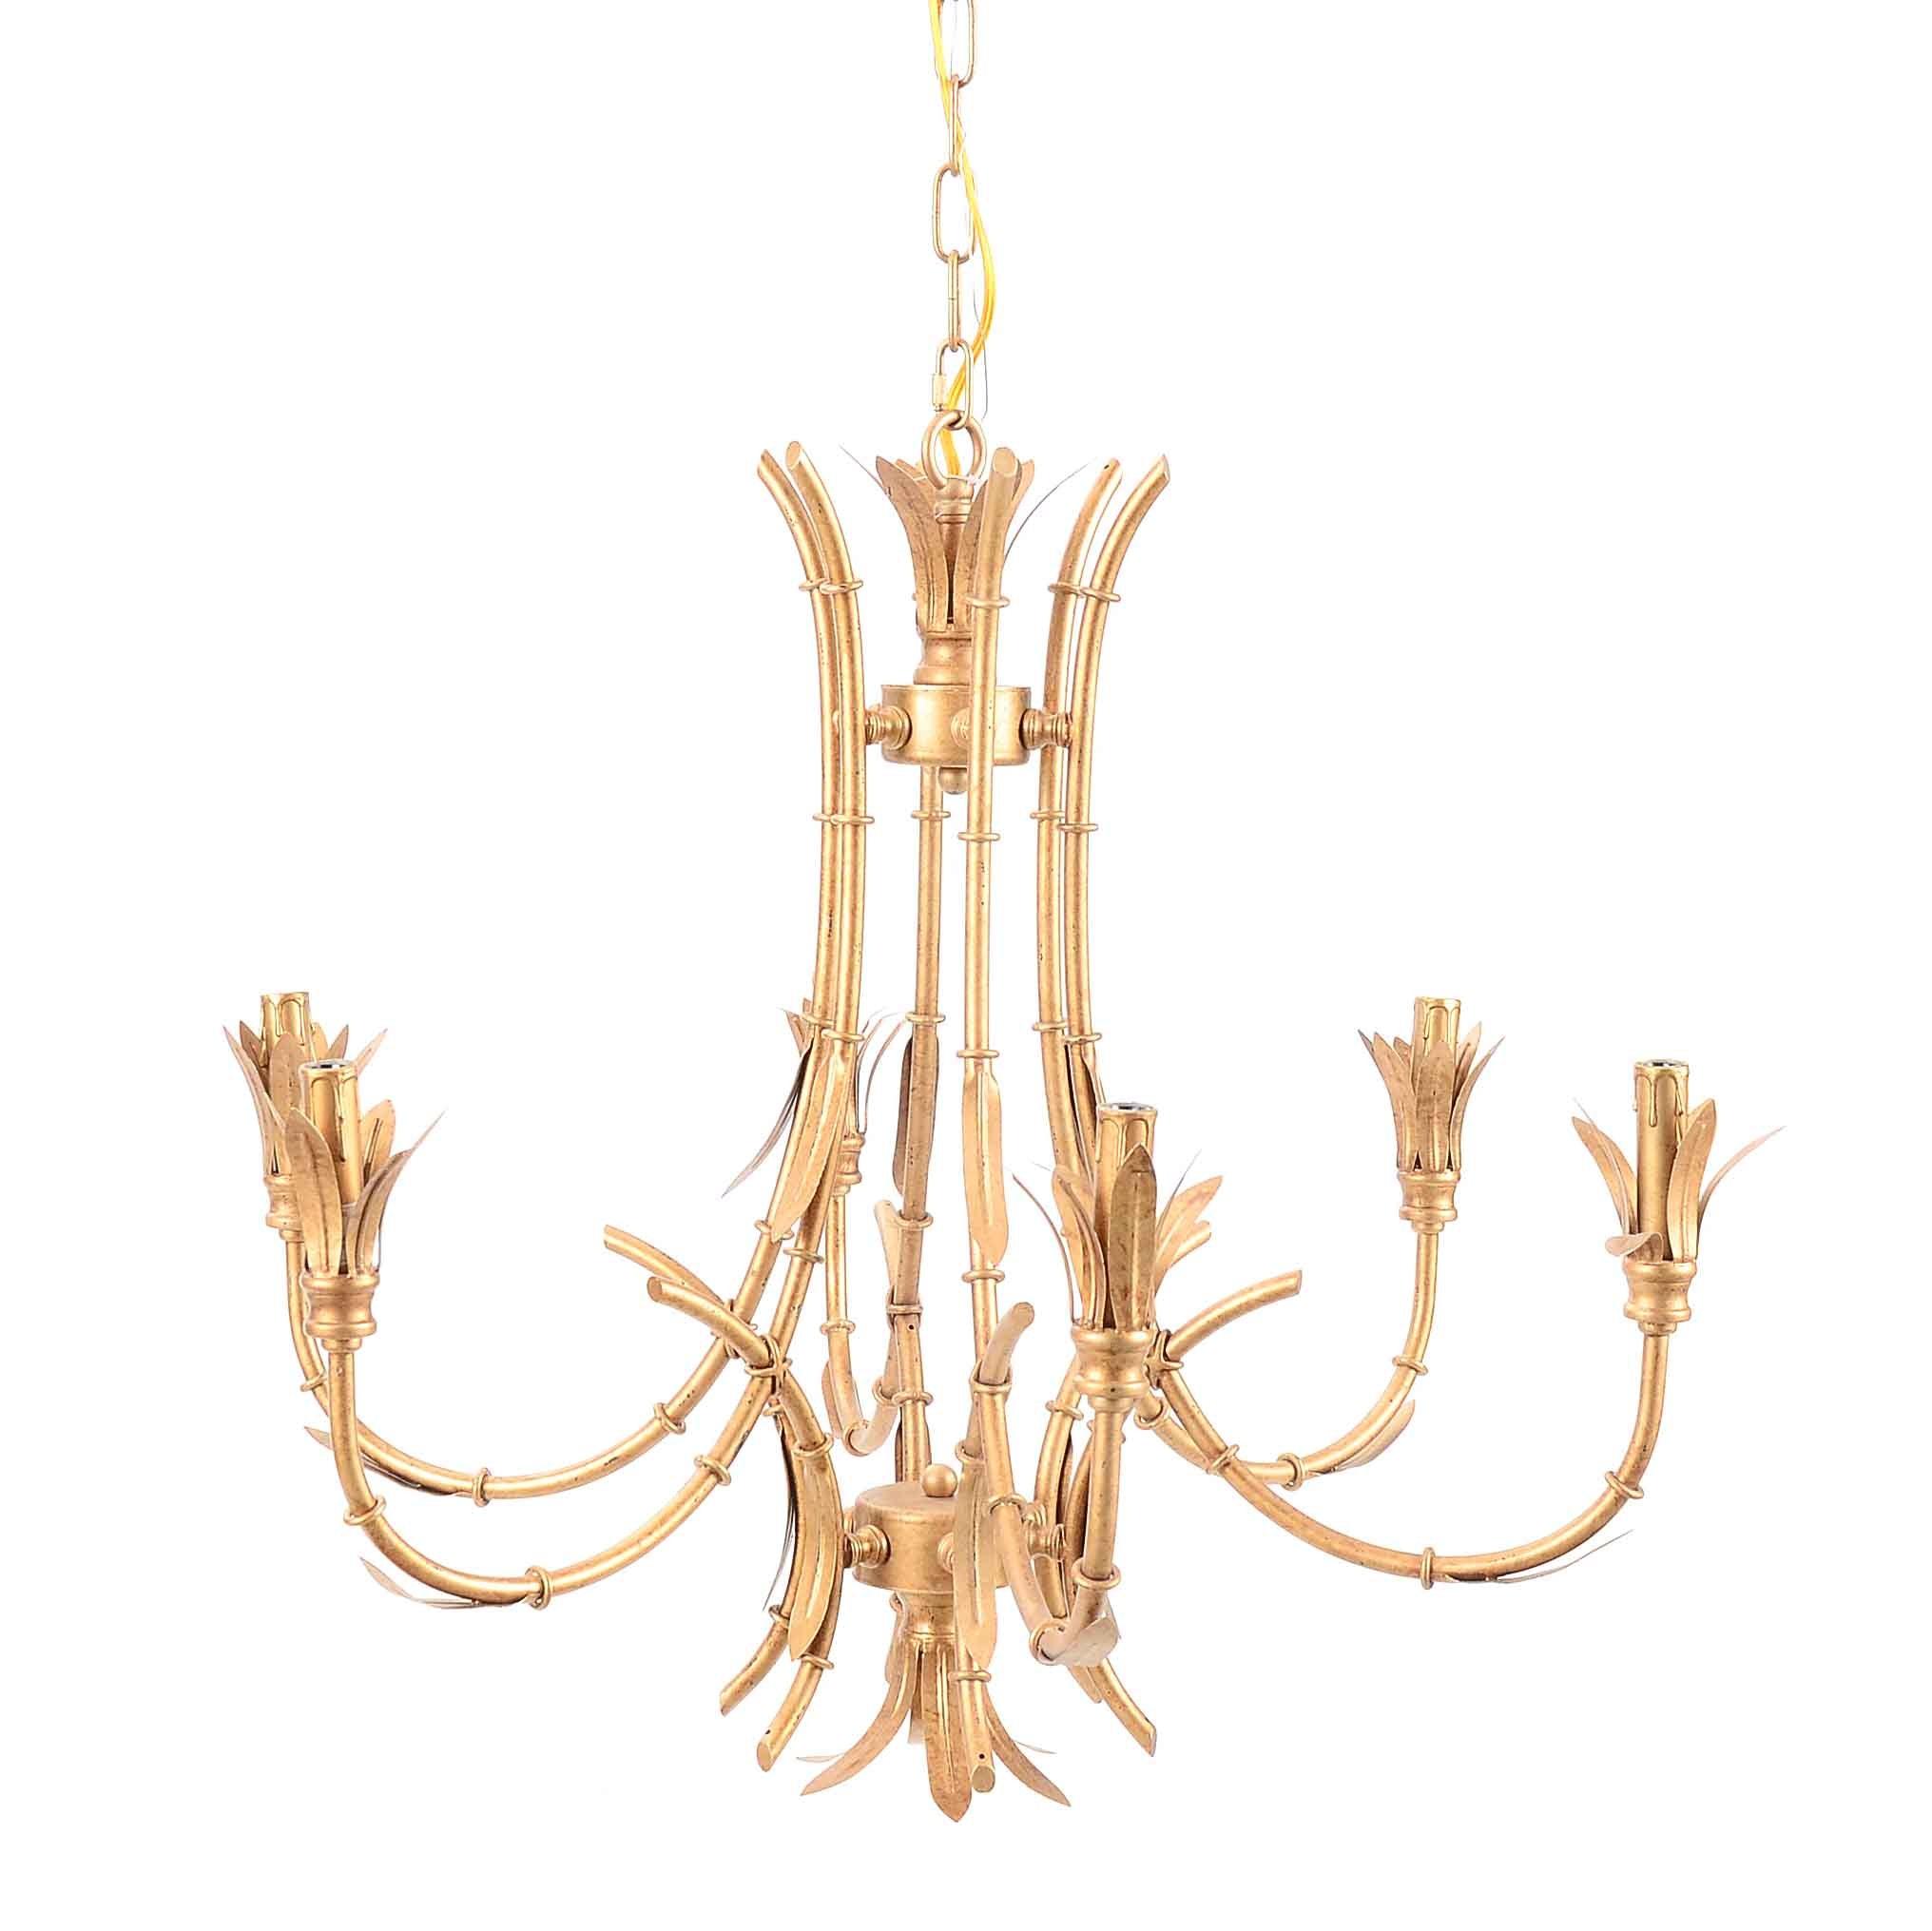 Tole Bamboo Motif Gold Tone Metal Chandelier